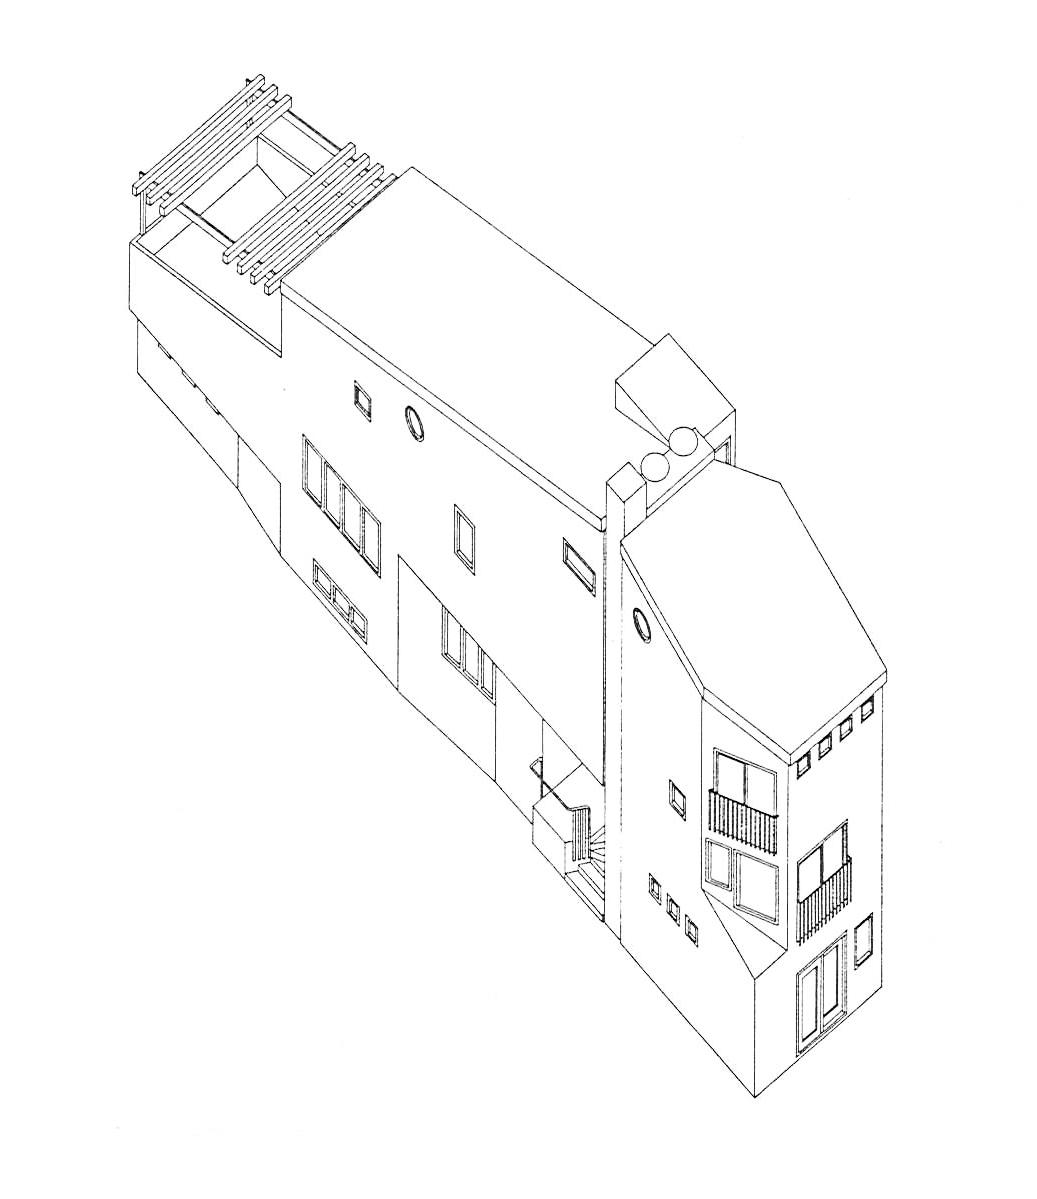 cohlmeyer-architecture-residential-design3.jpg